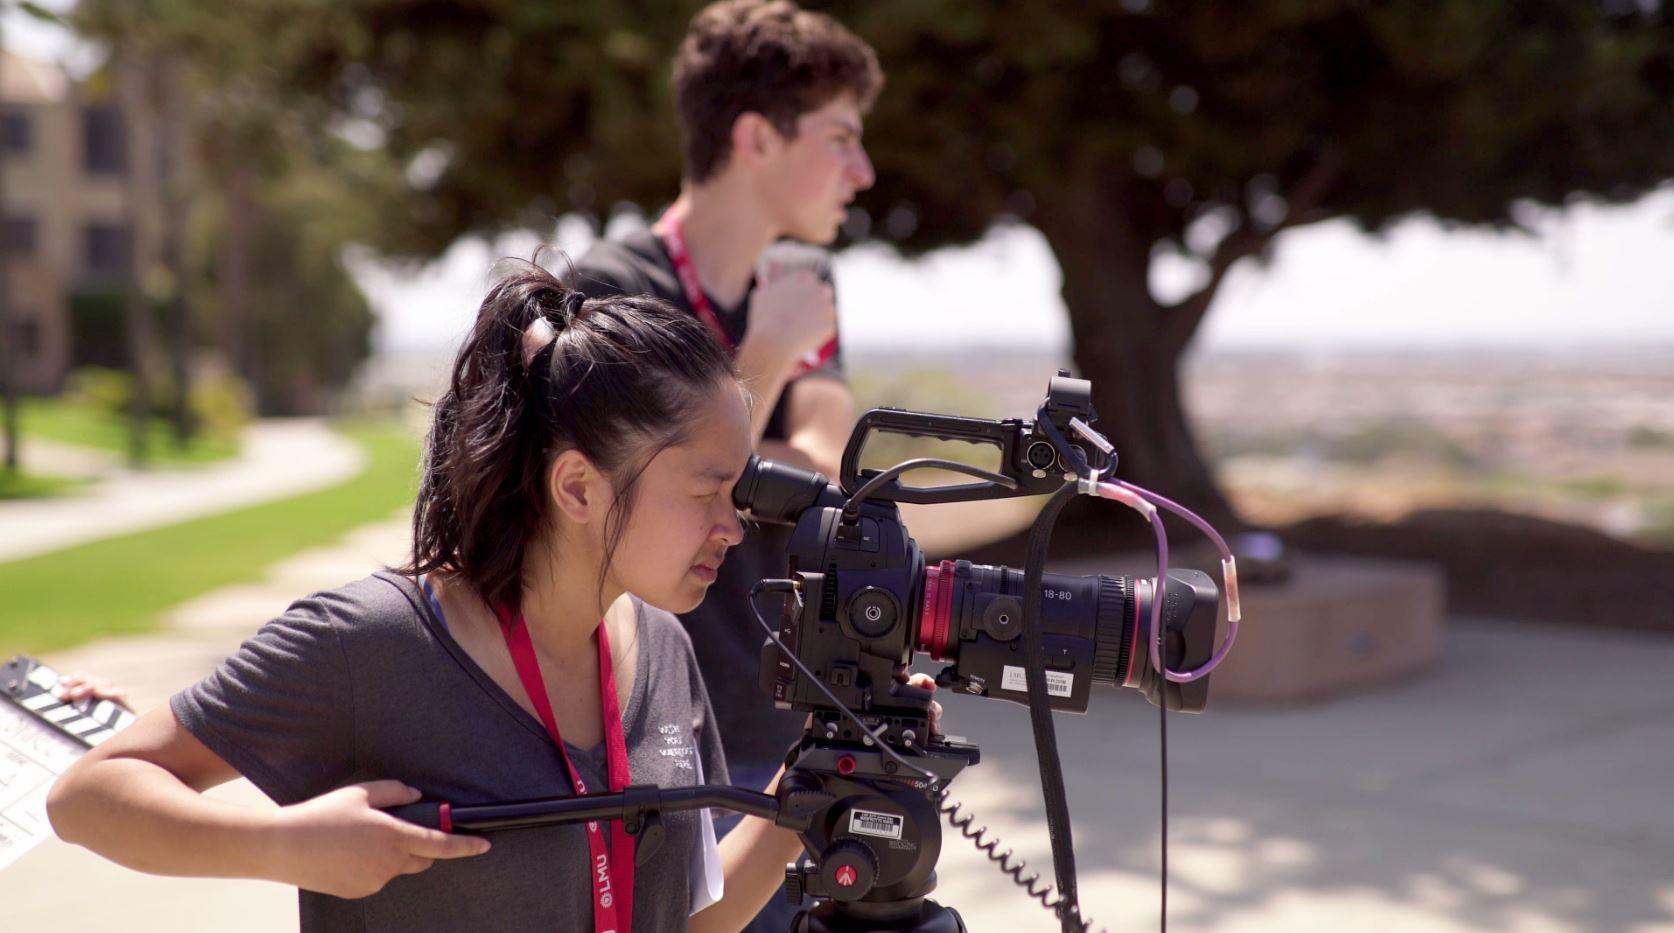 Summer Program - Filmmaking and Digital Media | LMU Pre-College Programs: Film Production: Social Impact Filmmaking